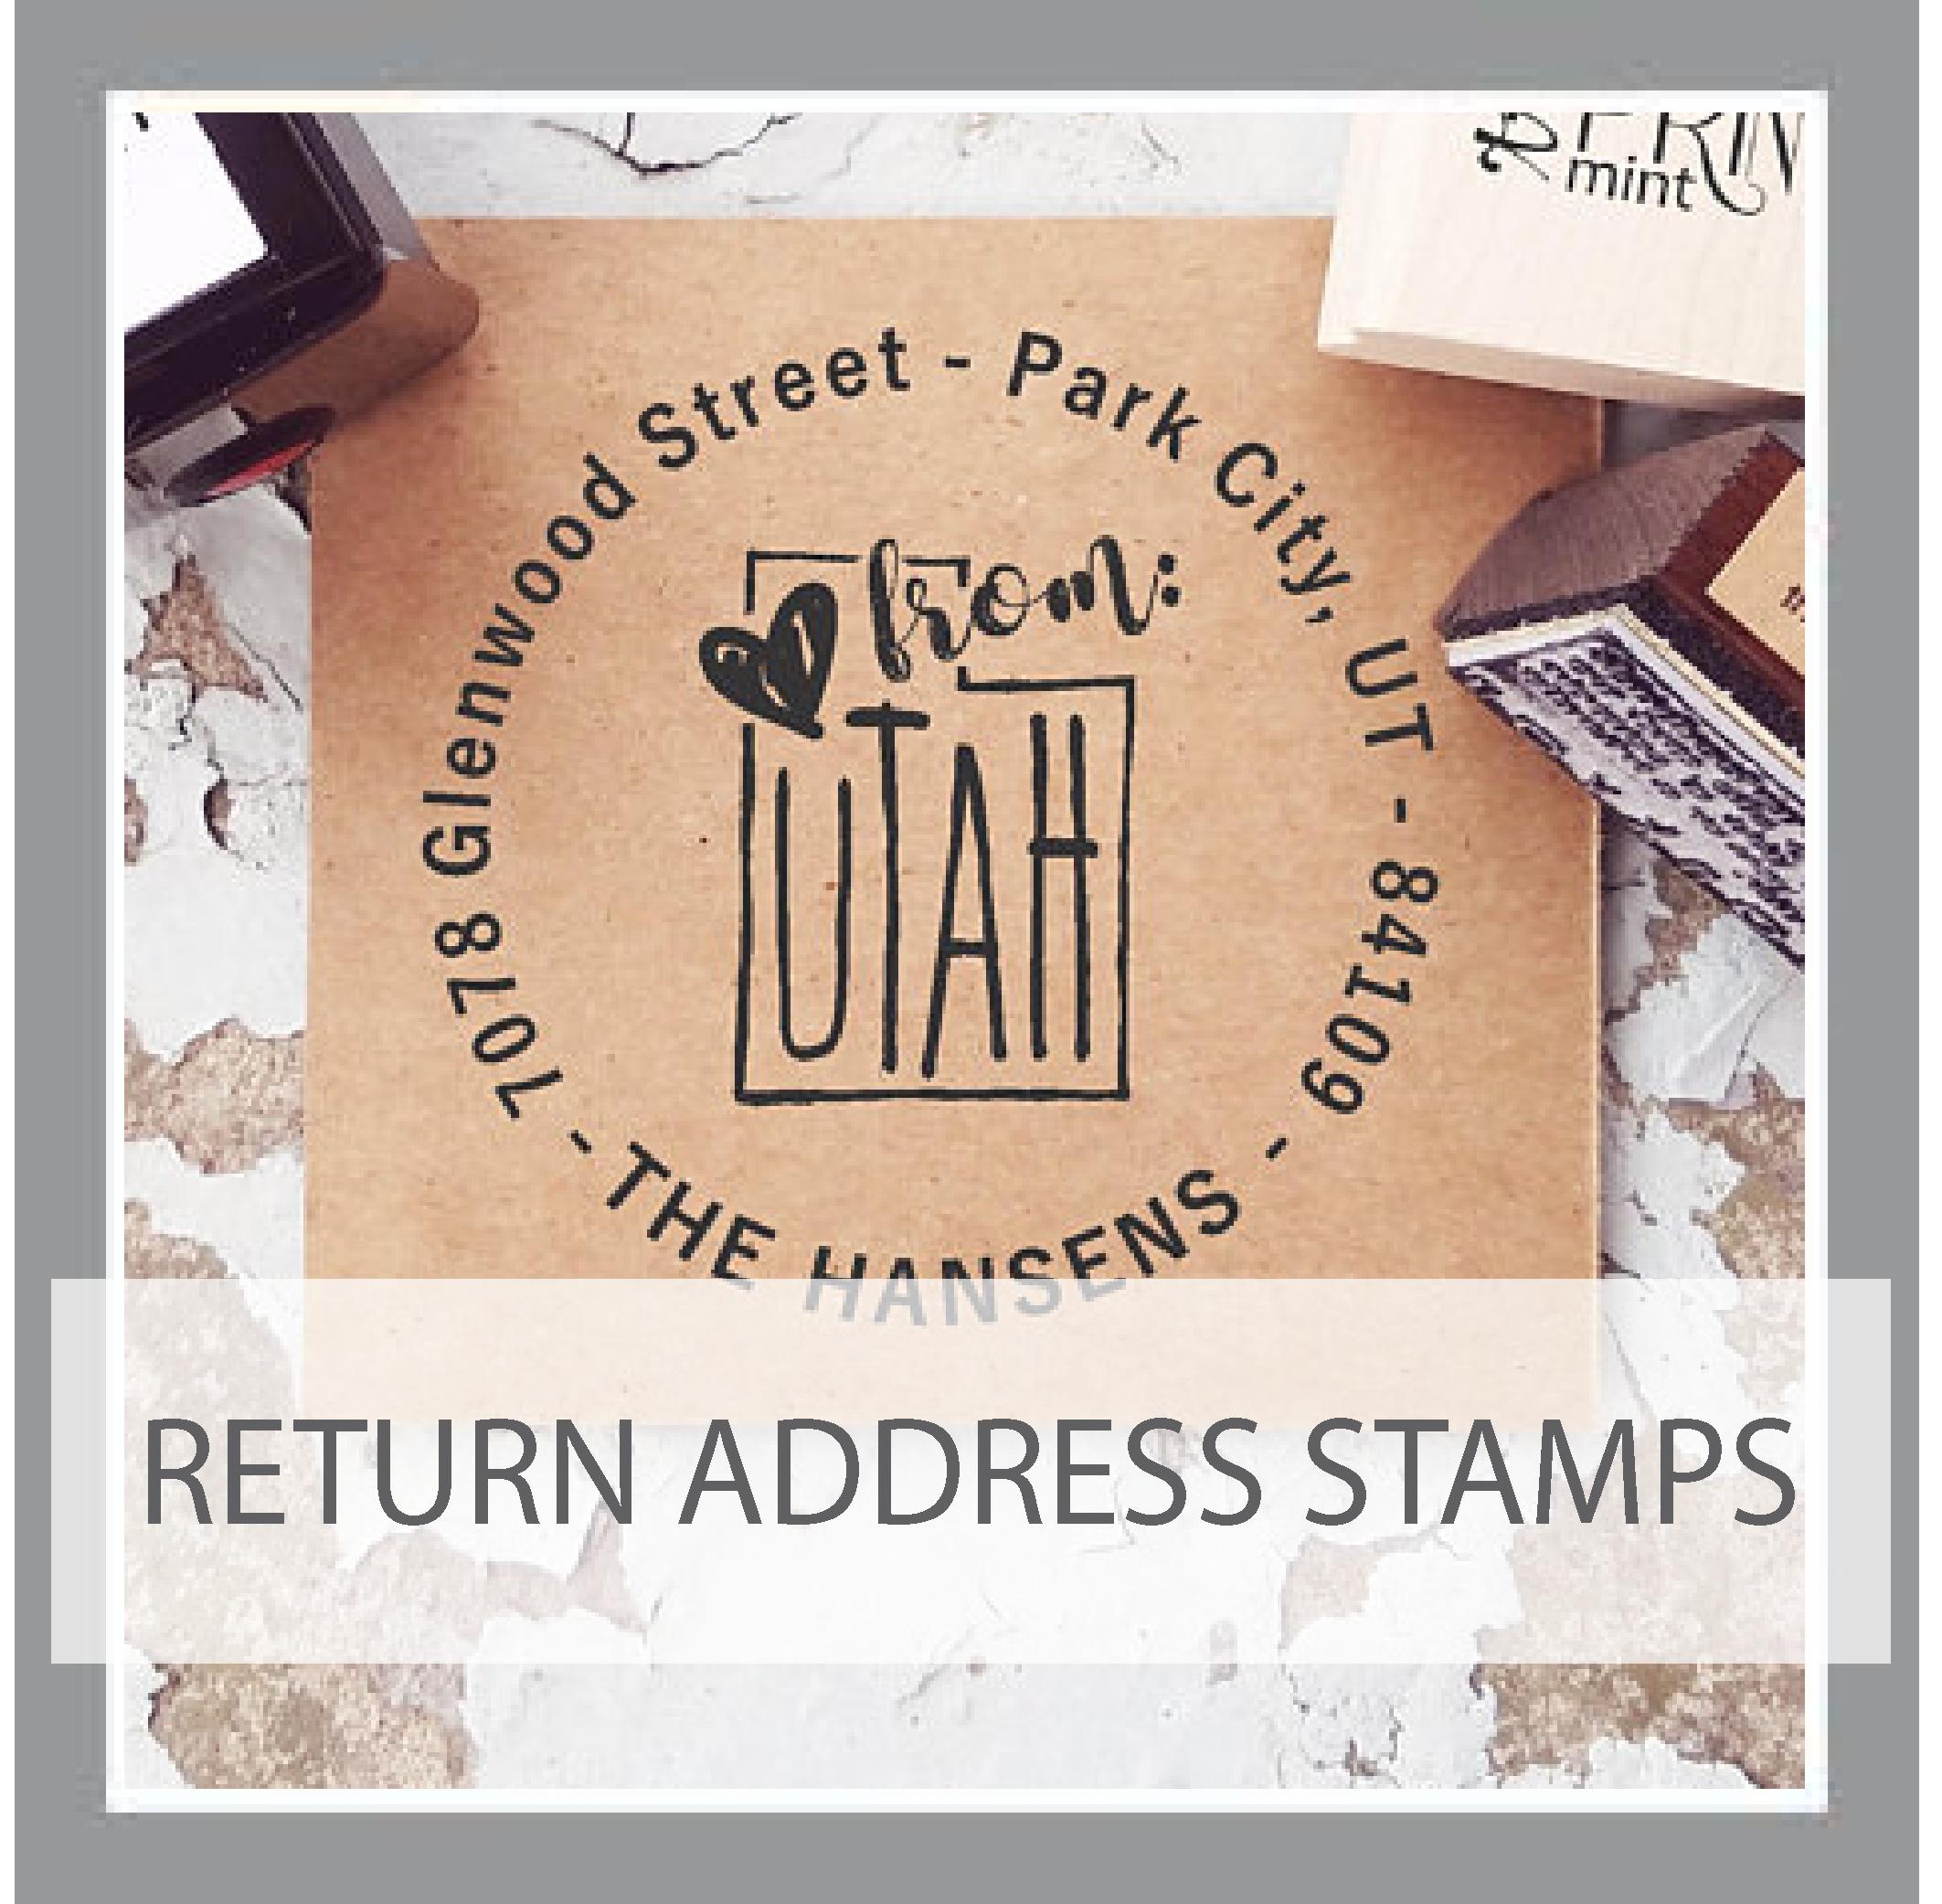 Return Address Stamps